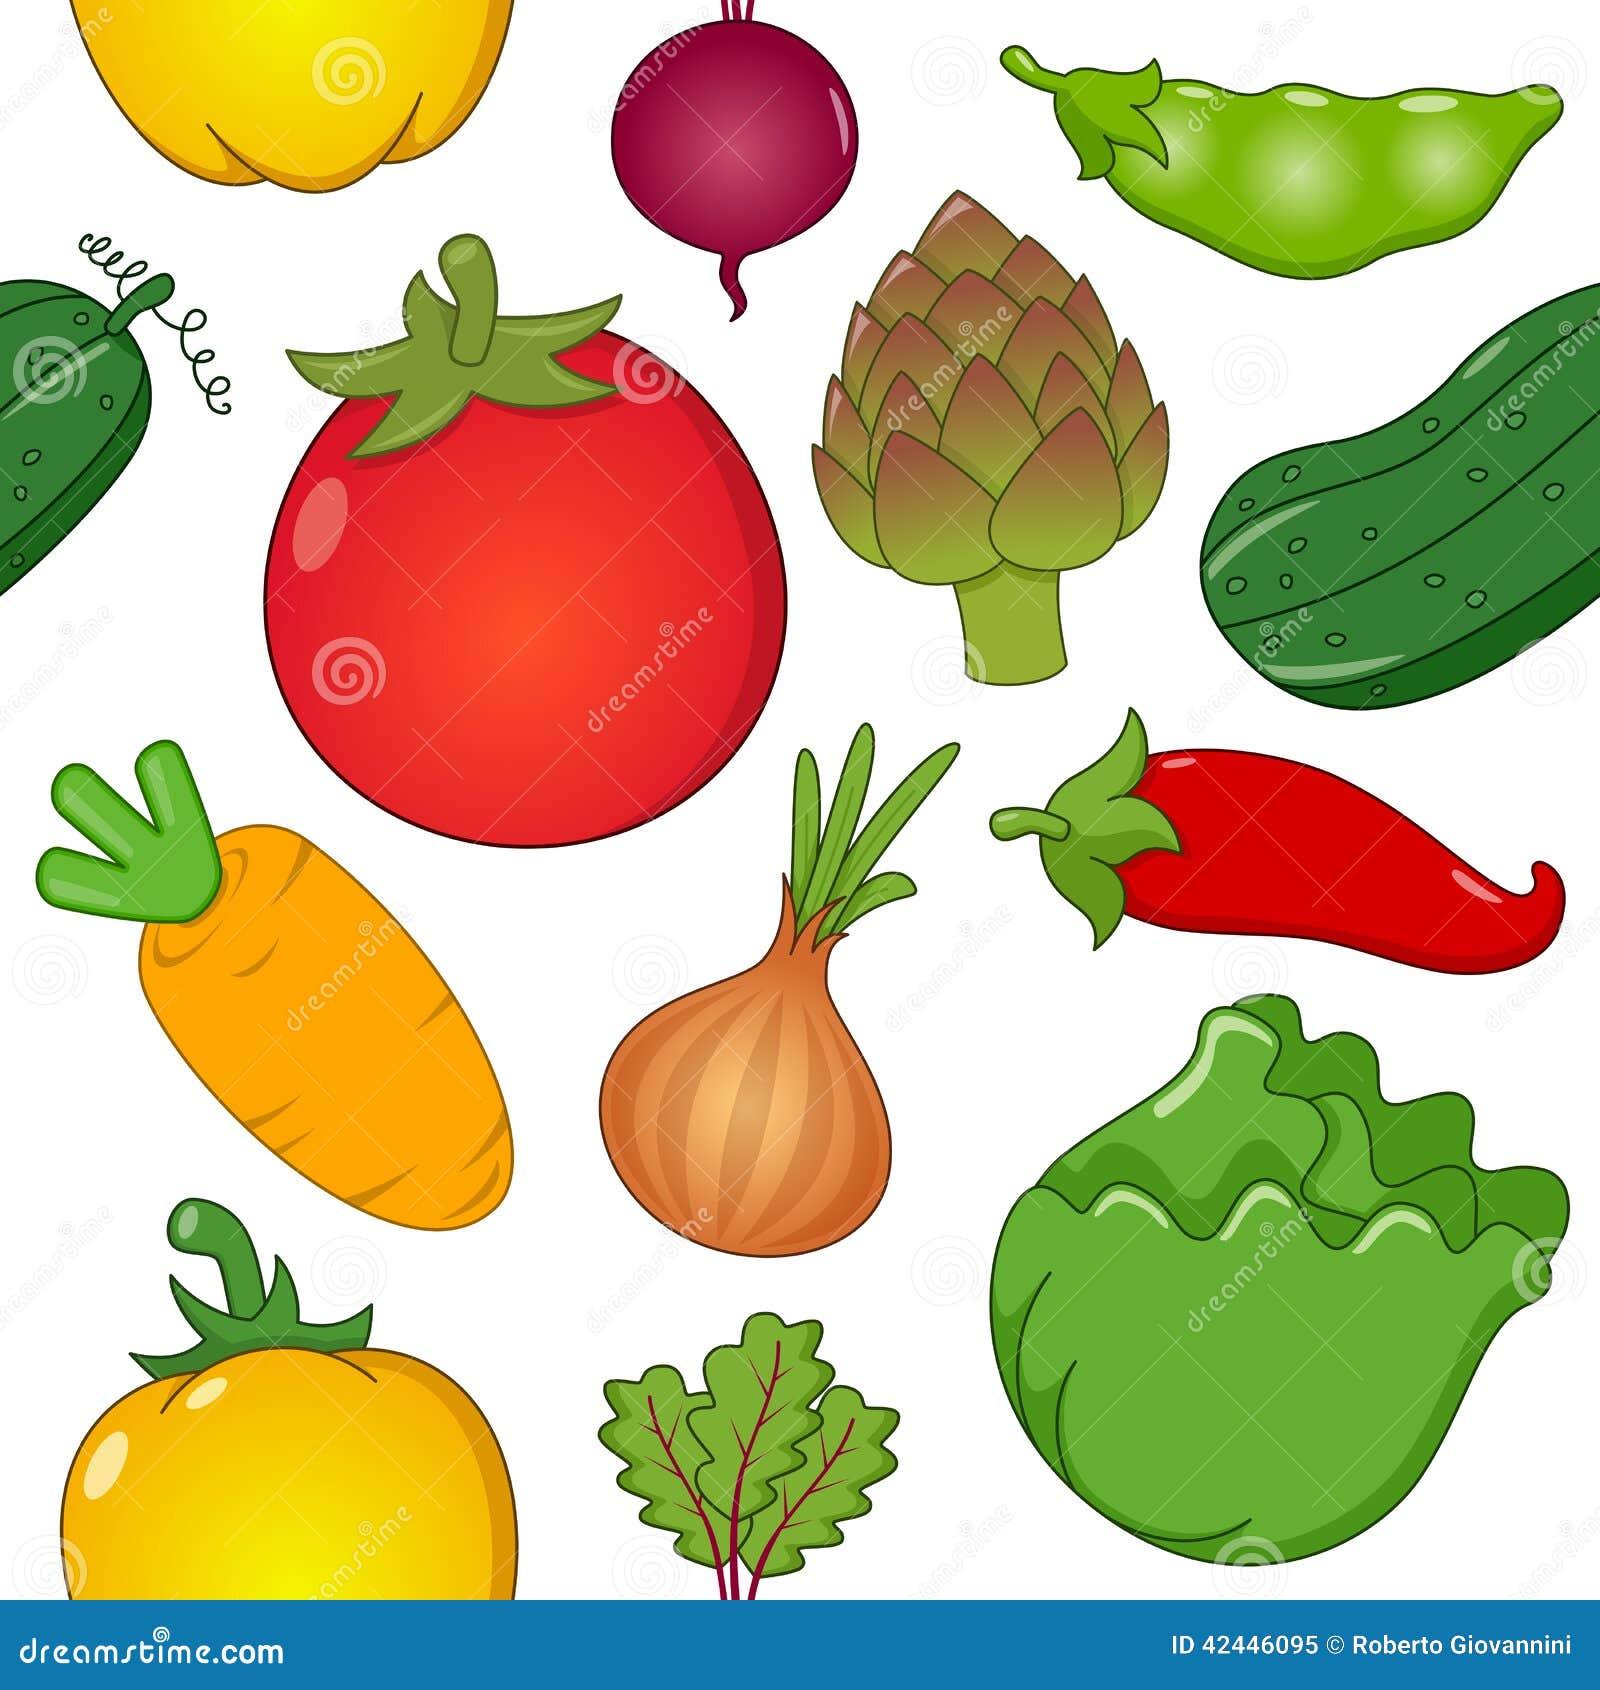 Red Onion Illustration Vegetable Symbols Seam...